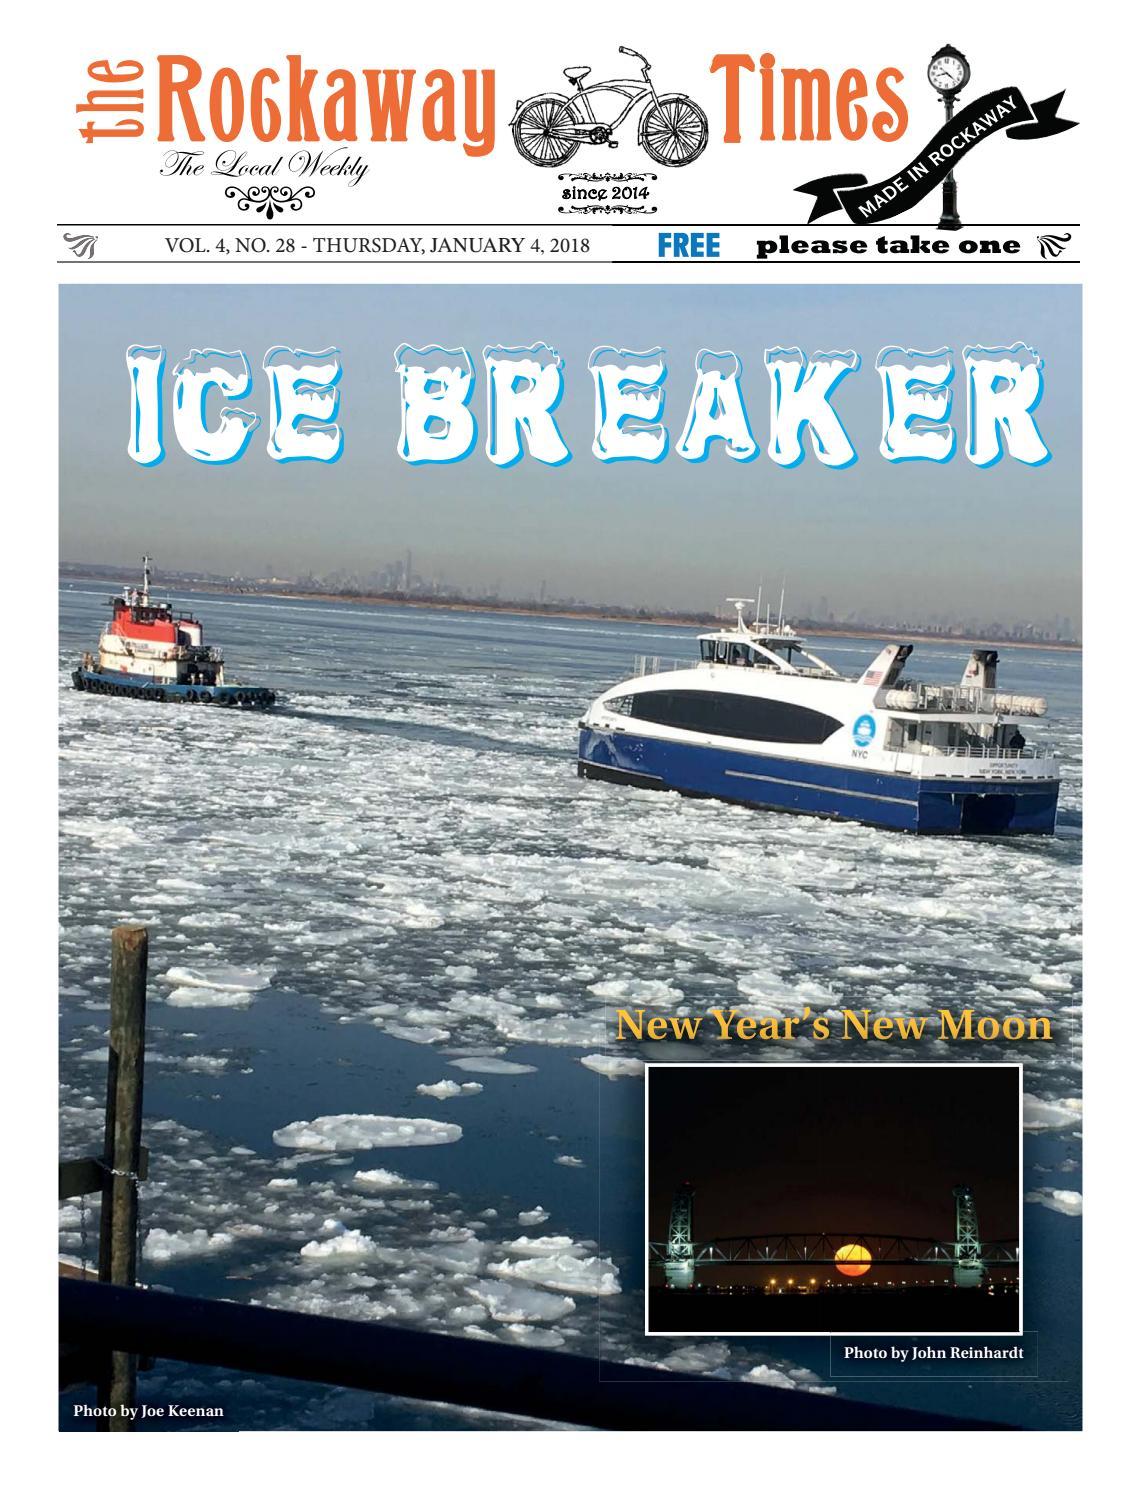 Rockaway Times 1 4 18 by Rockaway Times - issuu